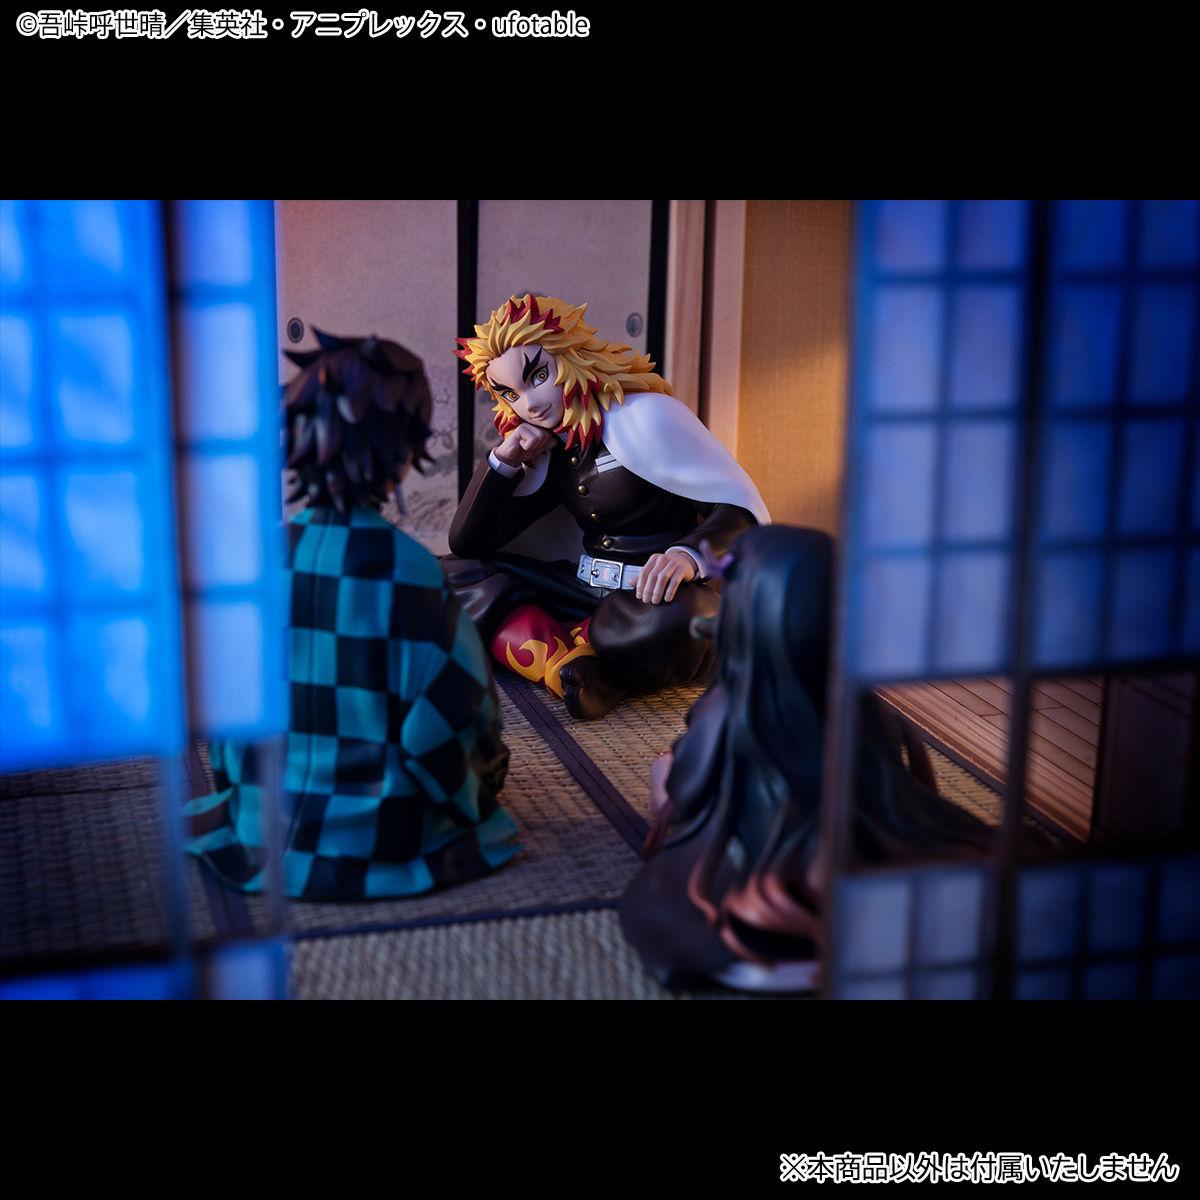 G.E.M.シリーズ『てのひら煉獄さん』鬼滅の刃 完成品フィギュア-008